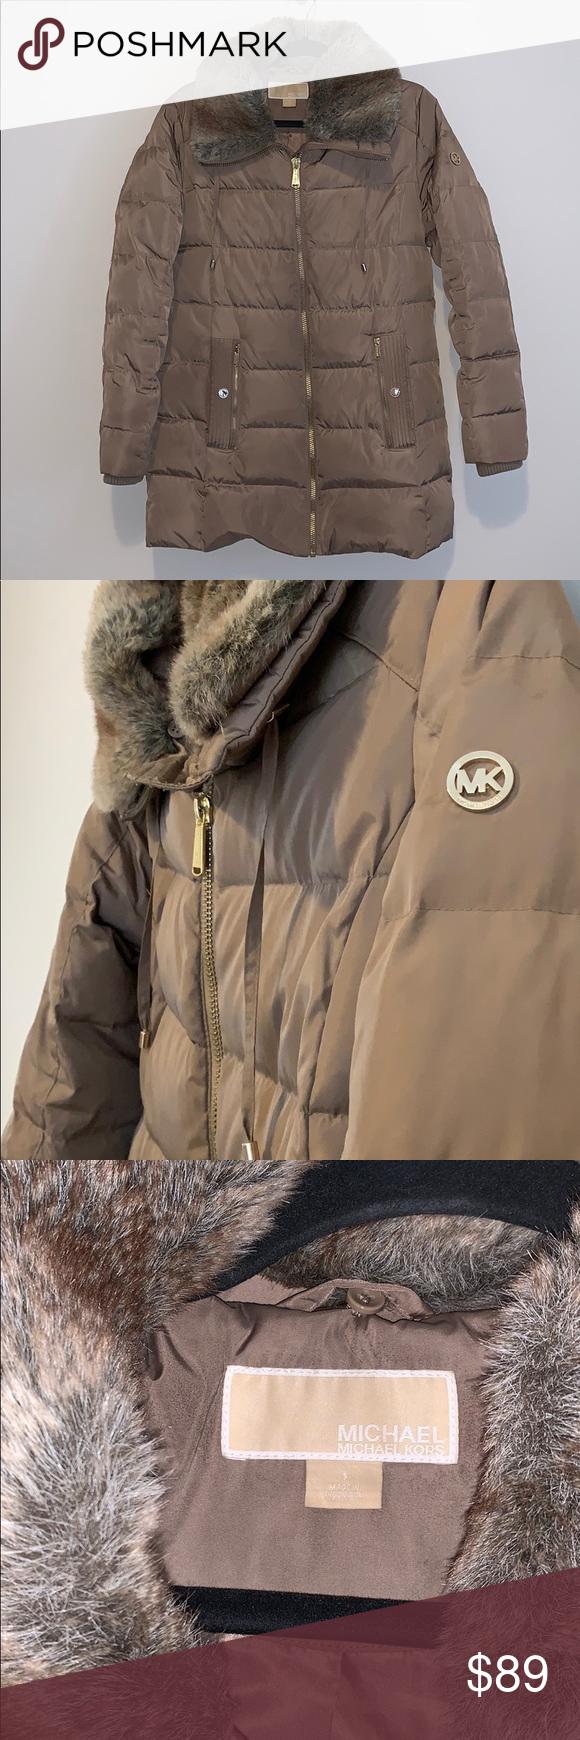 Michael Kors Truffle Faux Fur Puffer Jacket Fashion Faux Fur Puffer Jacket Michael Kors Jackets [ 1740 x 580 Pixel ]